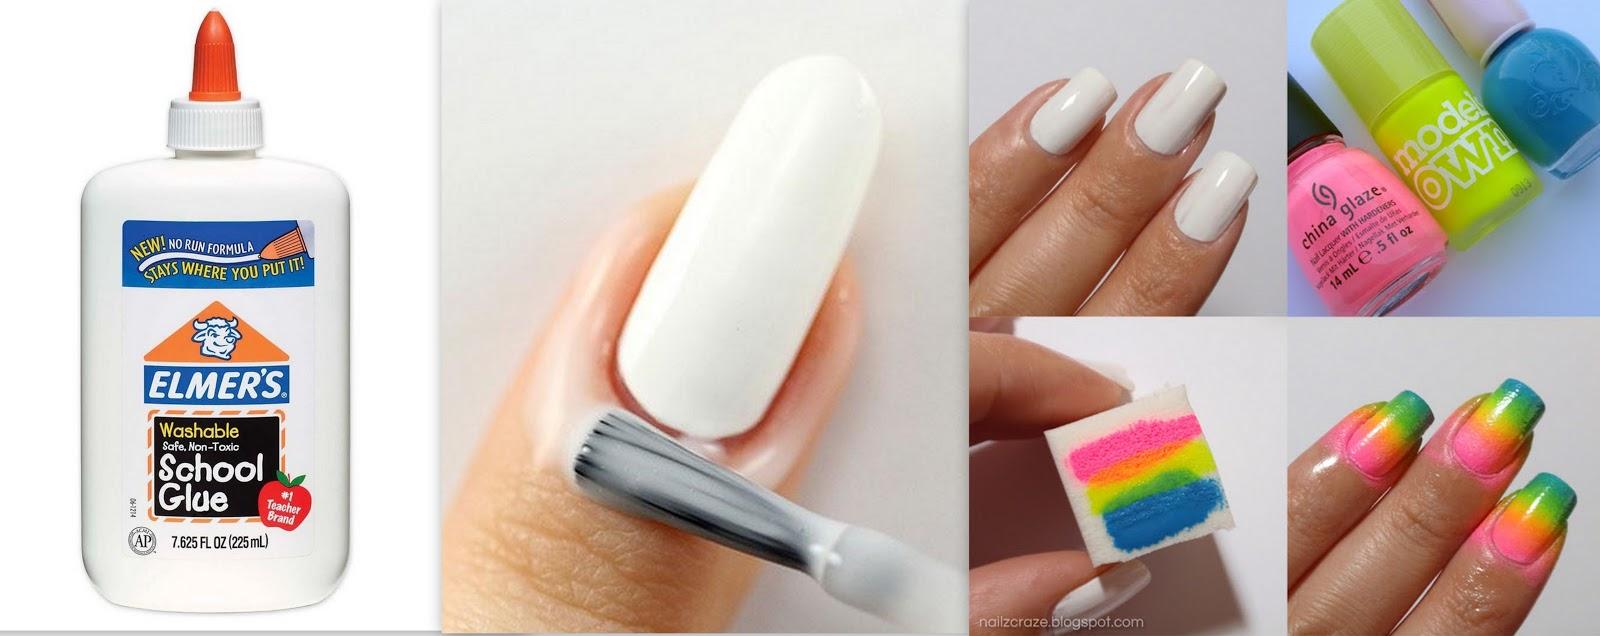 Style Sense Moments: Beauty | 3 nail hacks you need to know